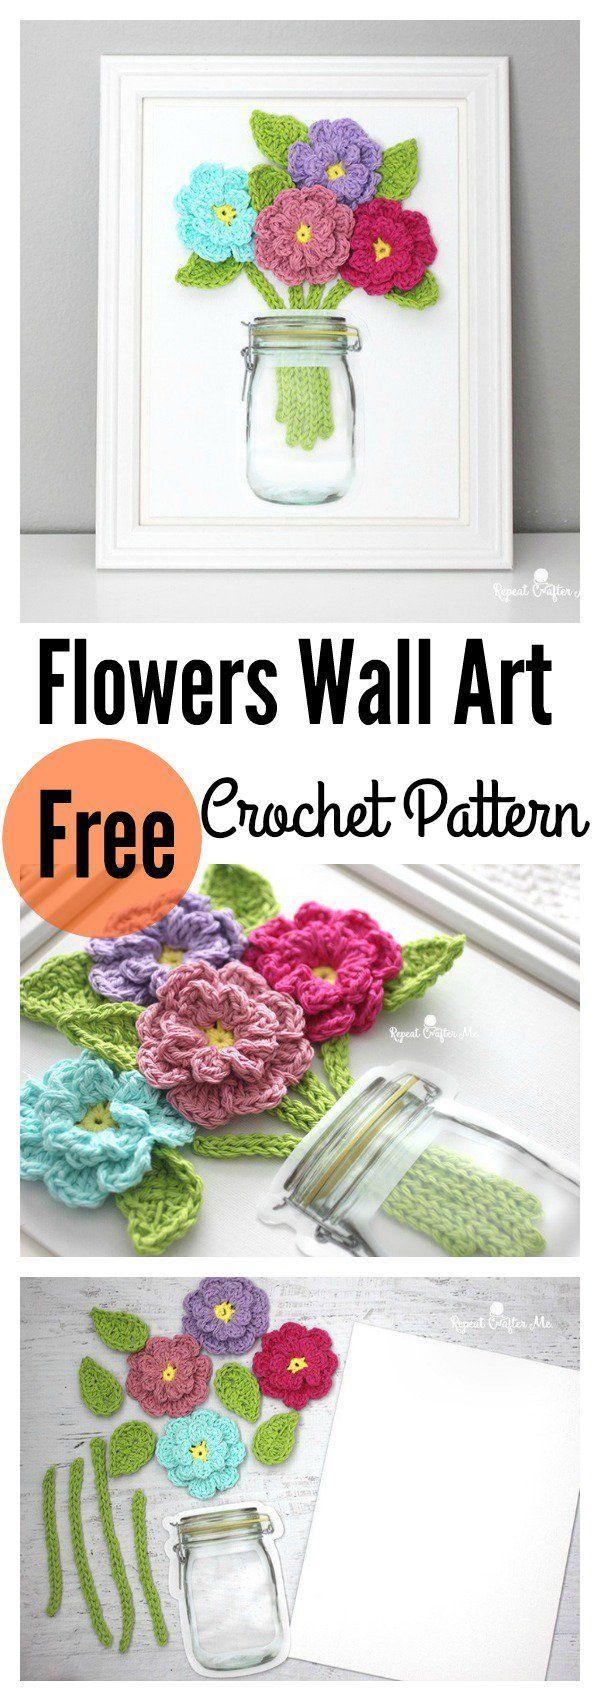 3D Wall Art Free Flower Crochet Patterns | Blüten häkeln, Blumen ...